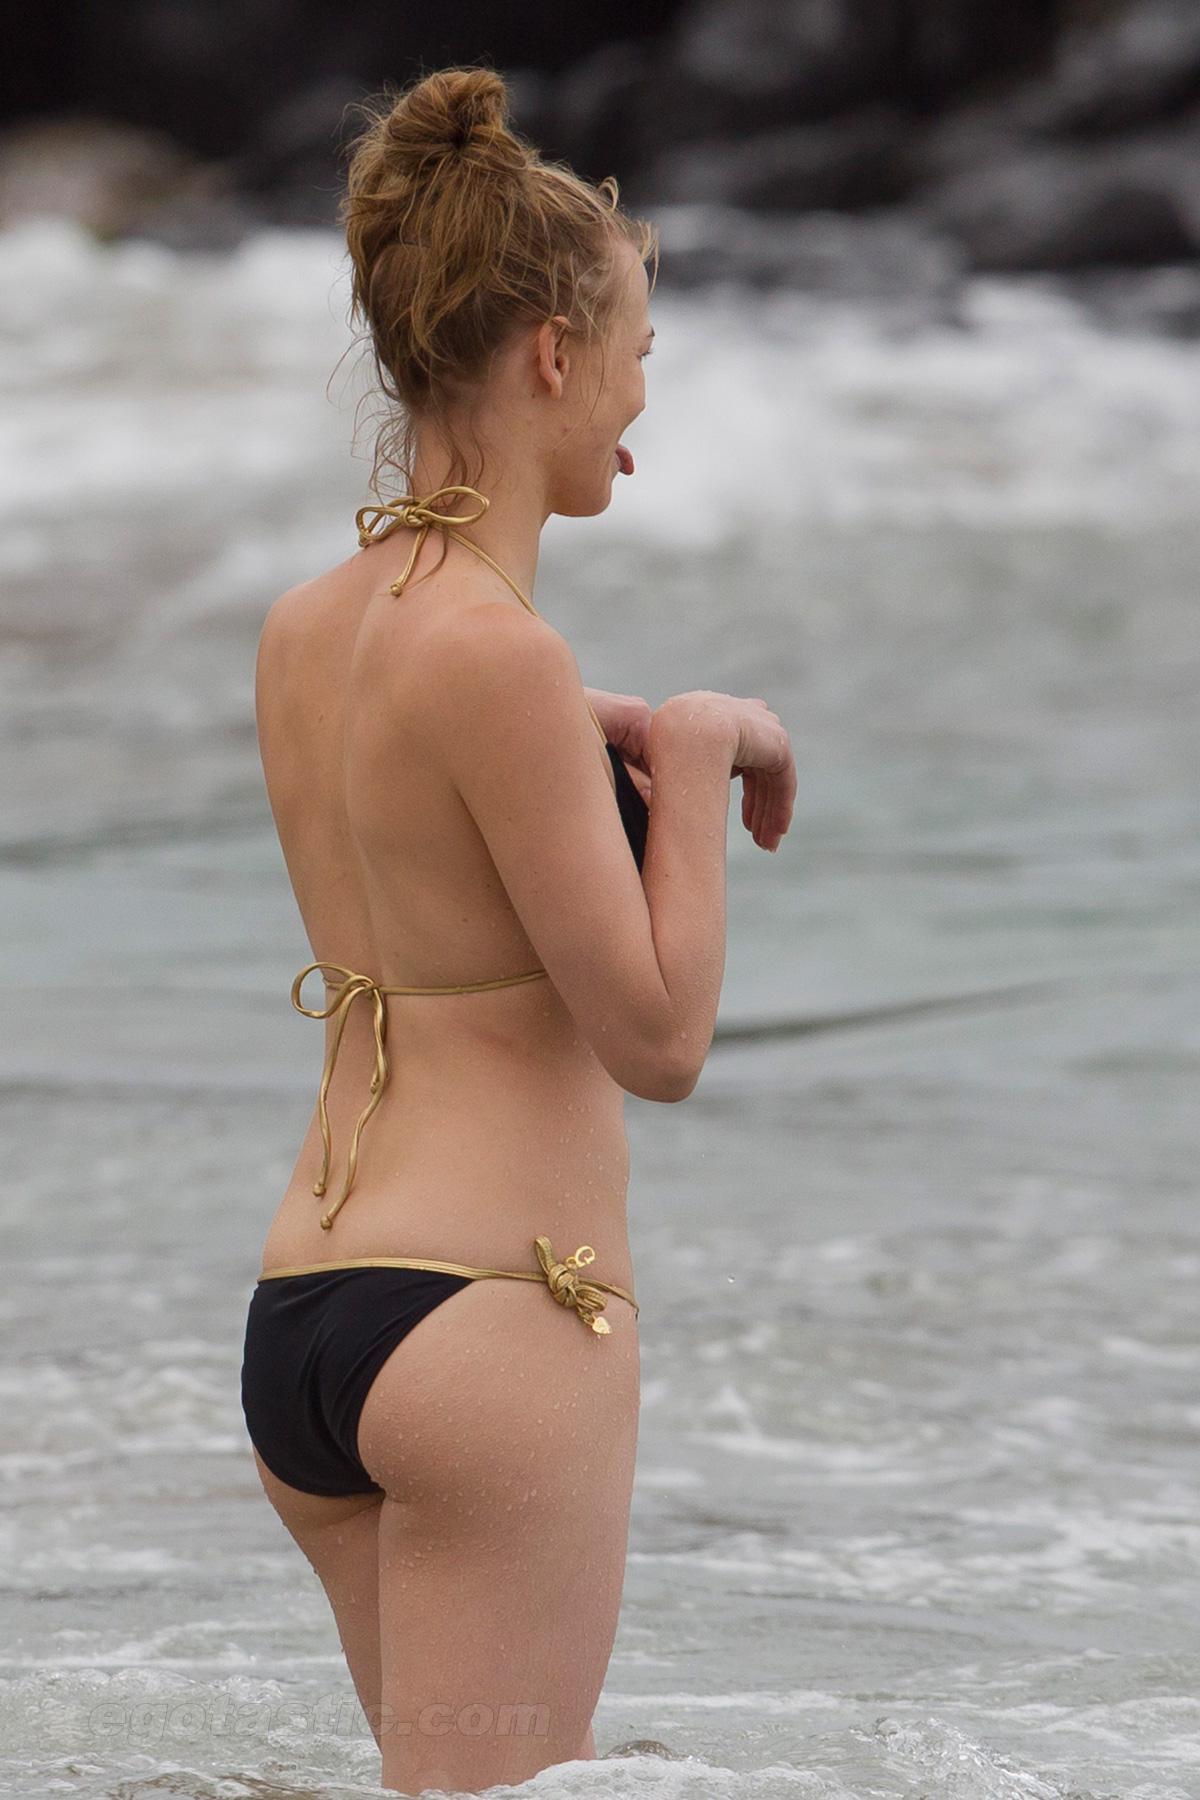 Yvonne strahovski nude manhattan night 2 - 2 part 10